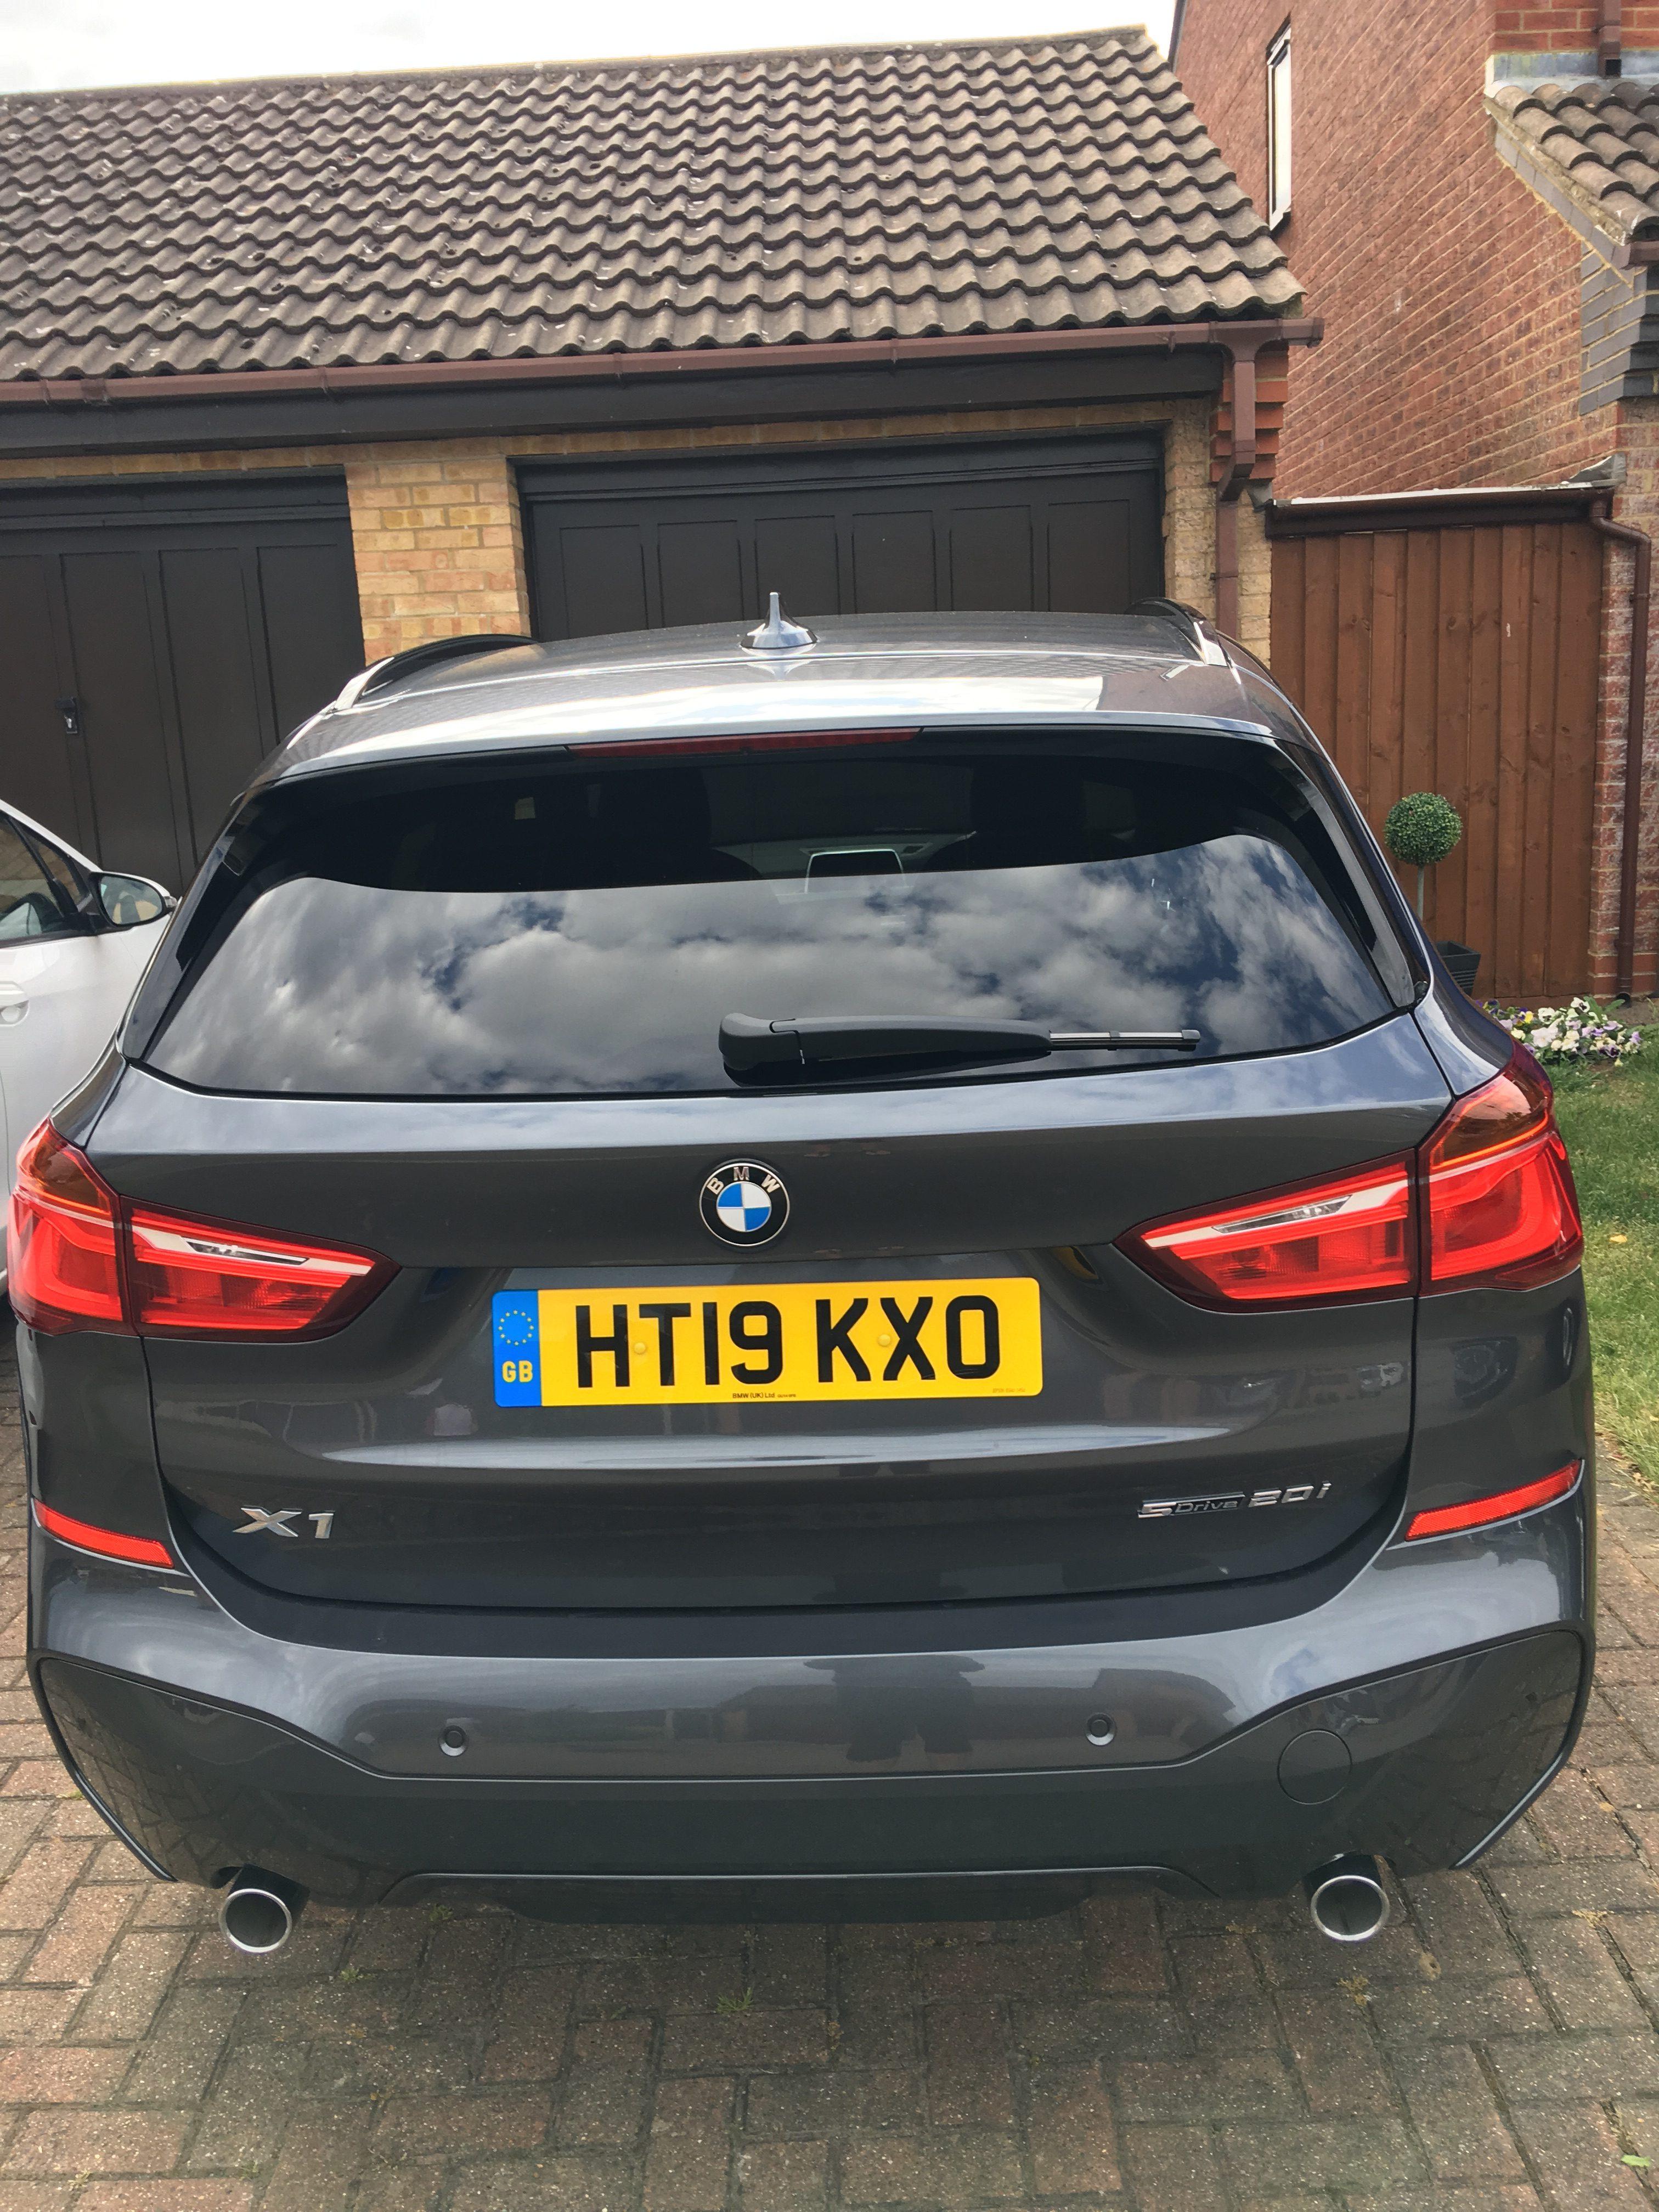 BMW X1 ESTATE sDrive 20i M Sport 5dr Step [Auto] Car Leasing Best Deals